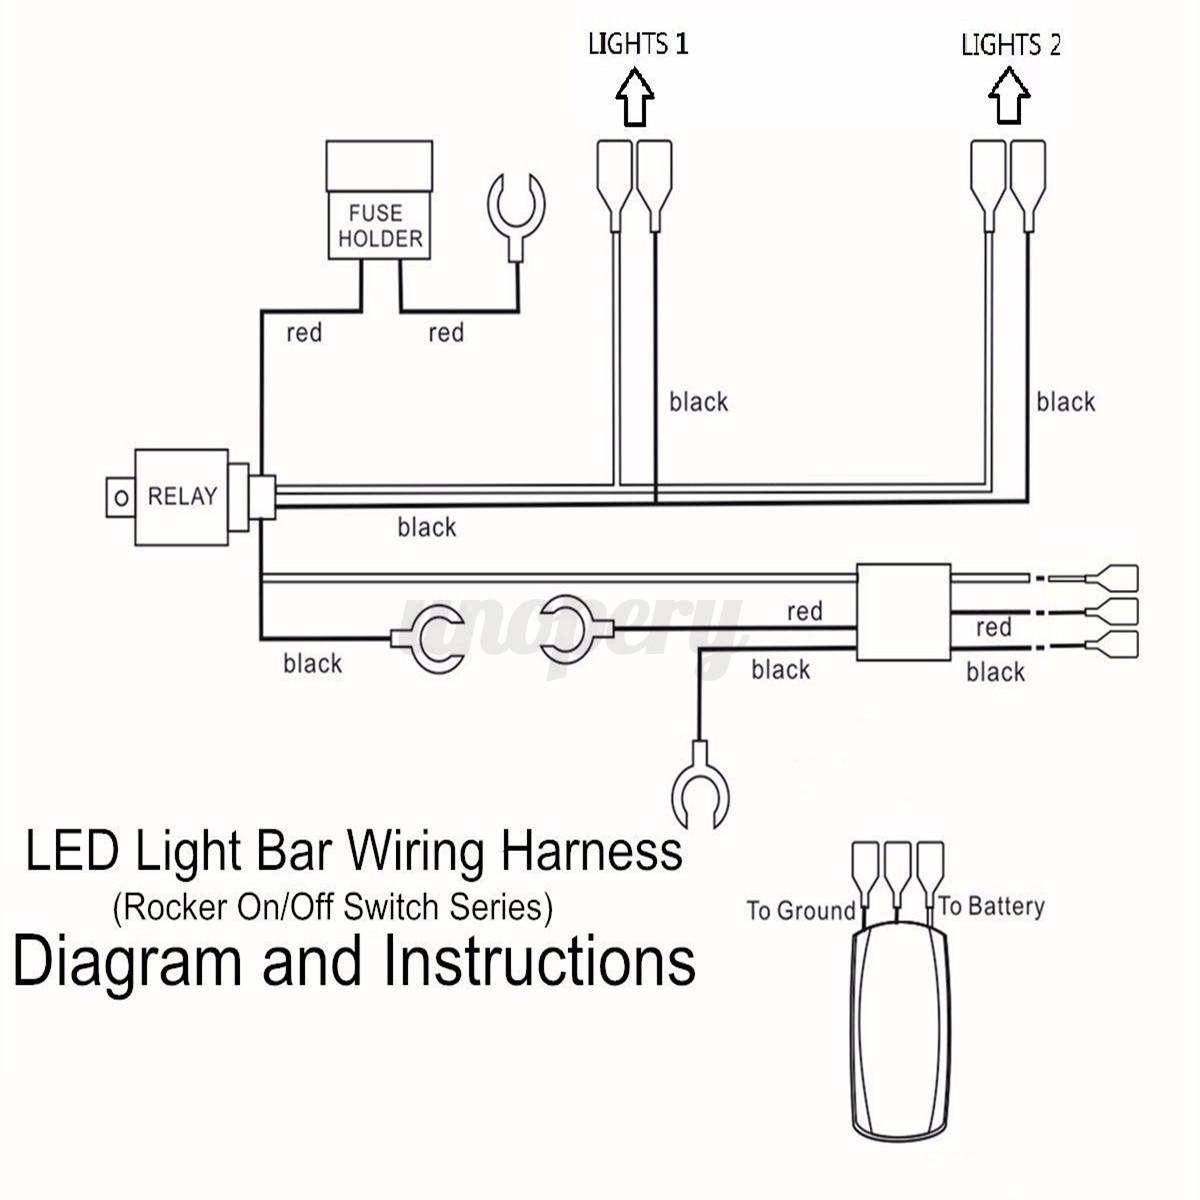 hight resolution of wiring harness cable led light bar laser rocker switch 12v 120v led wiring diagram led 12v